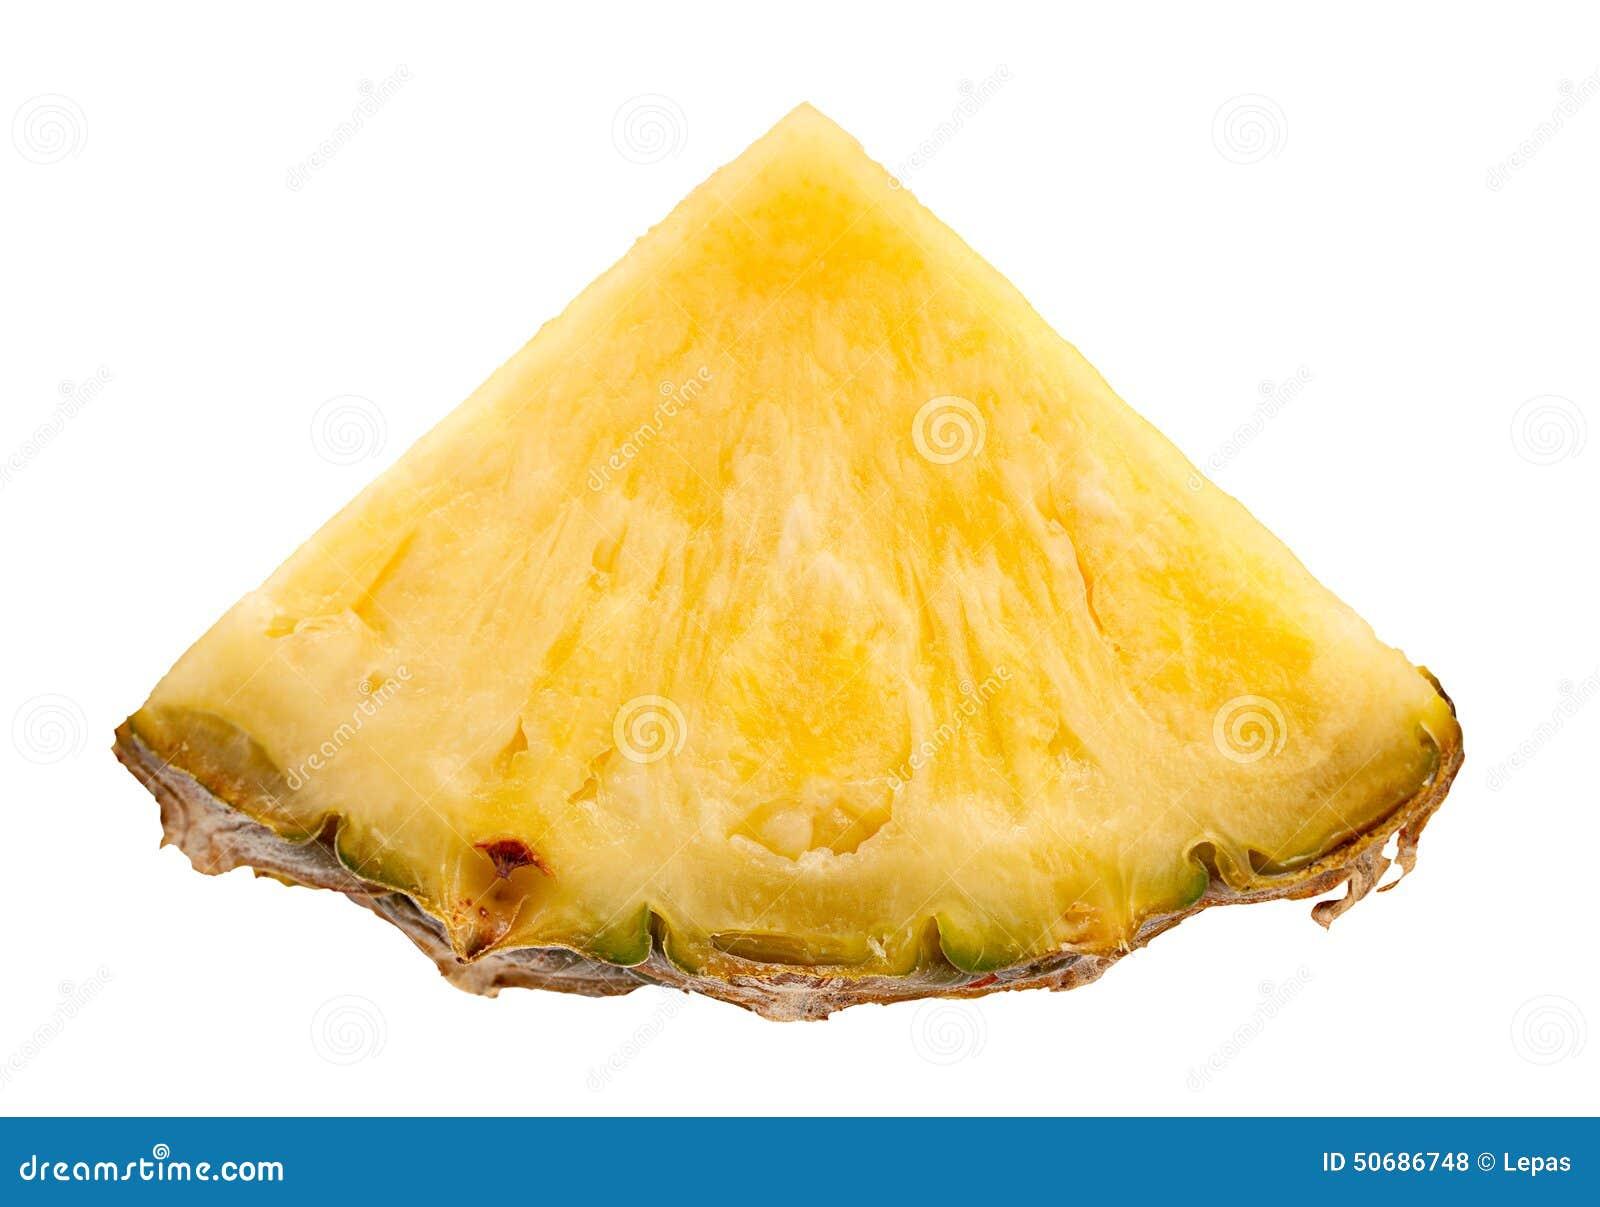 Download 菠萝果子切片 库存照片. 图片 包括有 菠萝, 黄色, 空白, 食物, 生气勃勃, 水多, 成熟, 片式 - 50686748